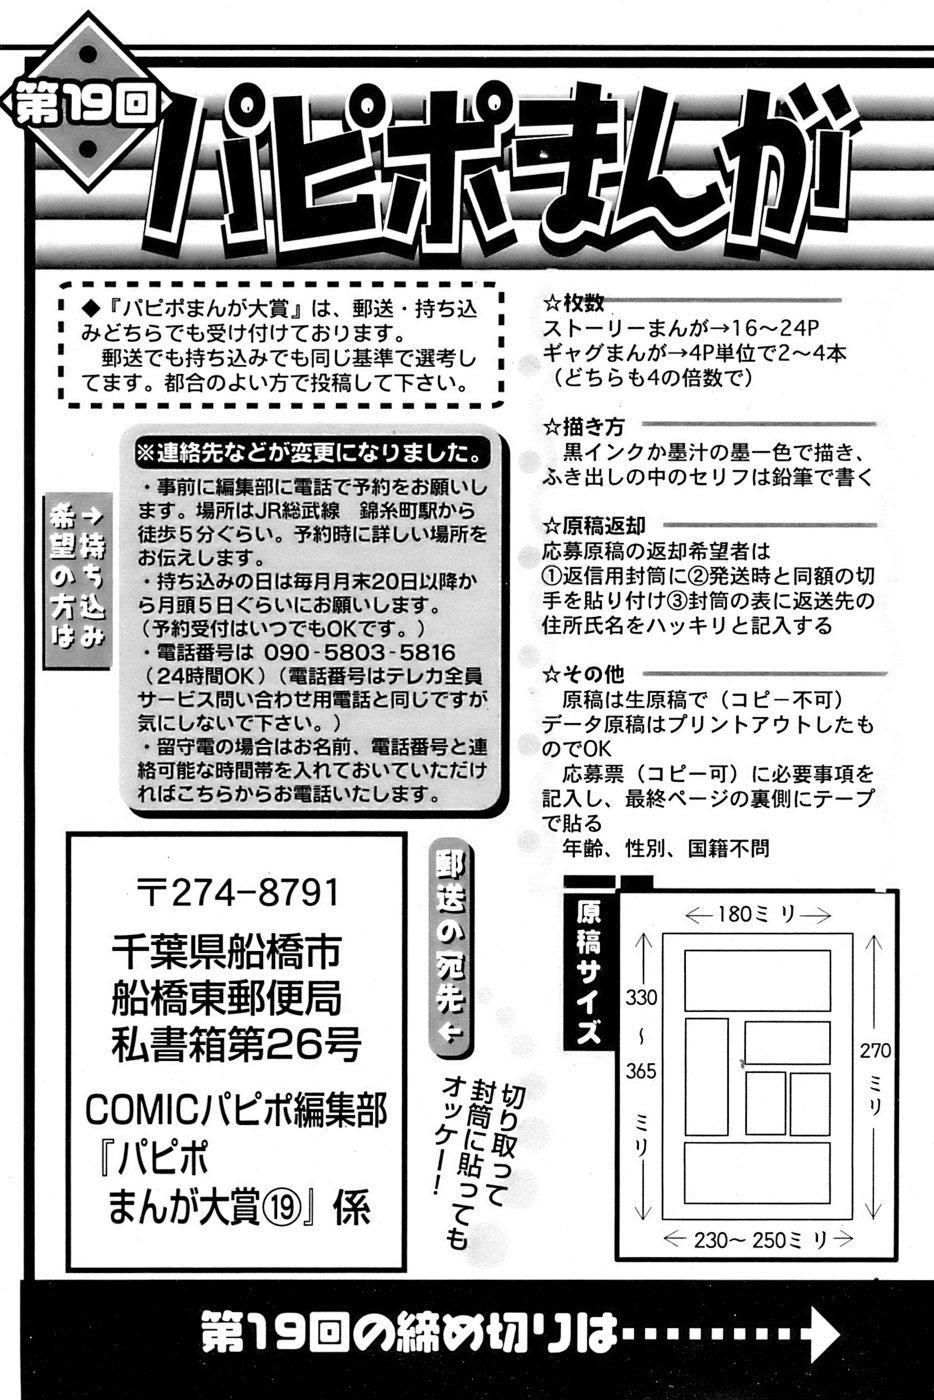 Comic Papipo 2007-01 234